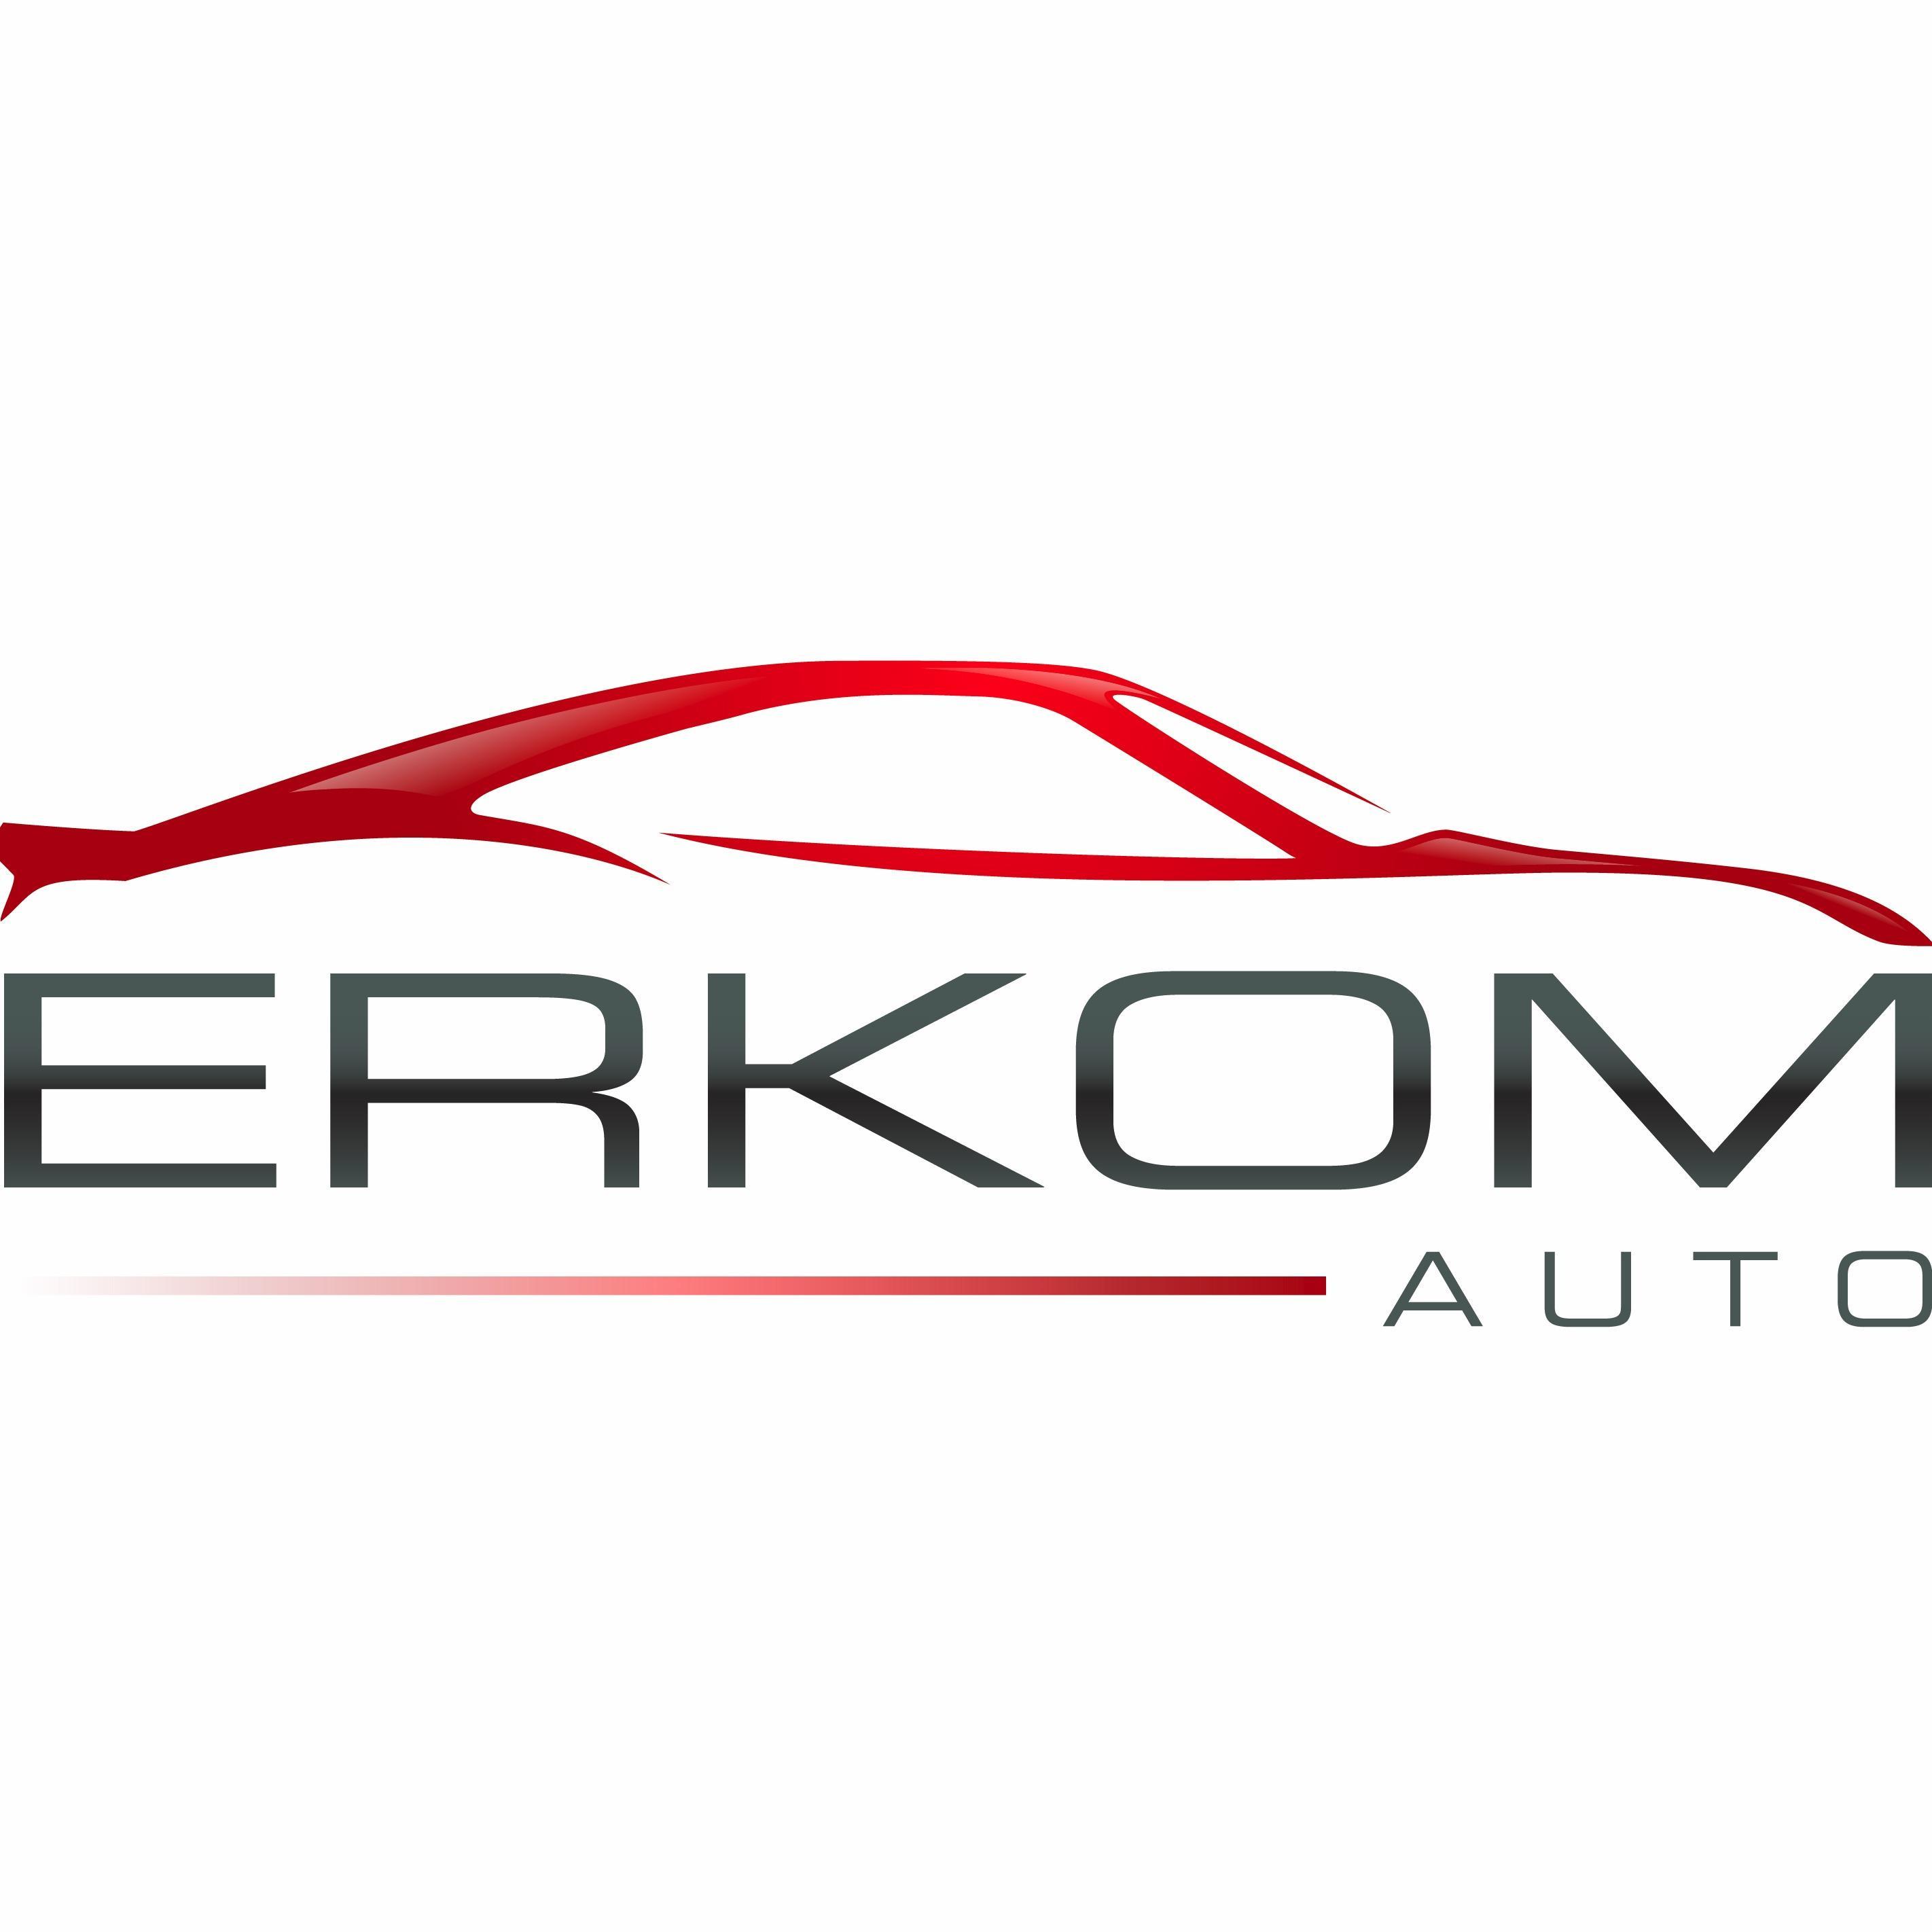 Erkom Auto - El Cajon, CA 92021 - (619)312-1217 | ShowMeLocal.com